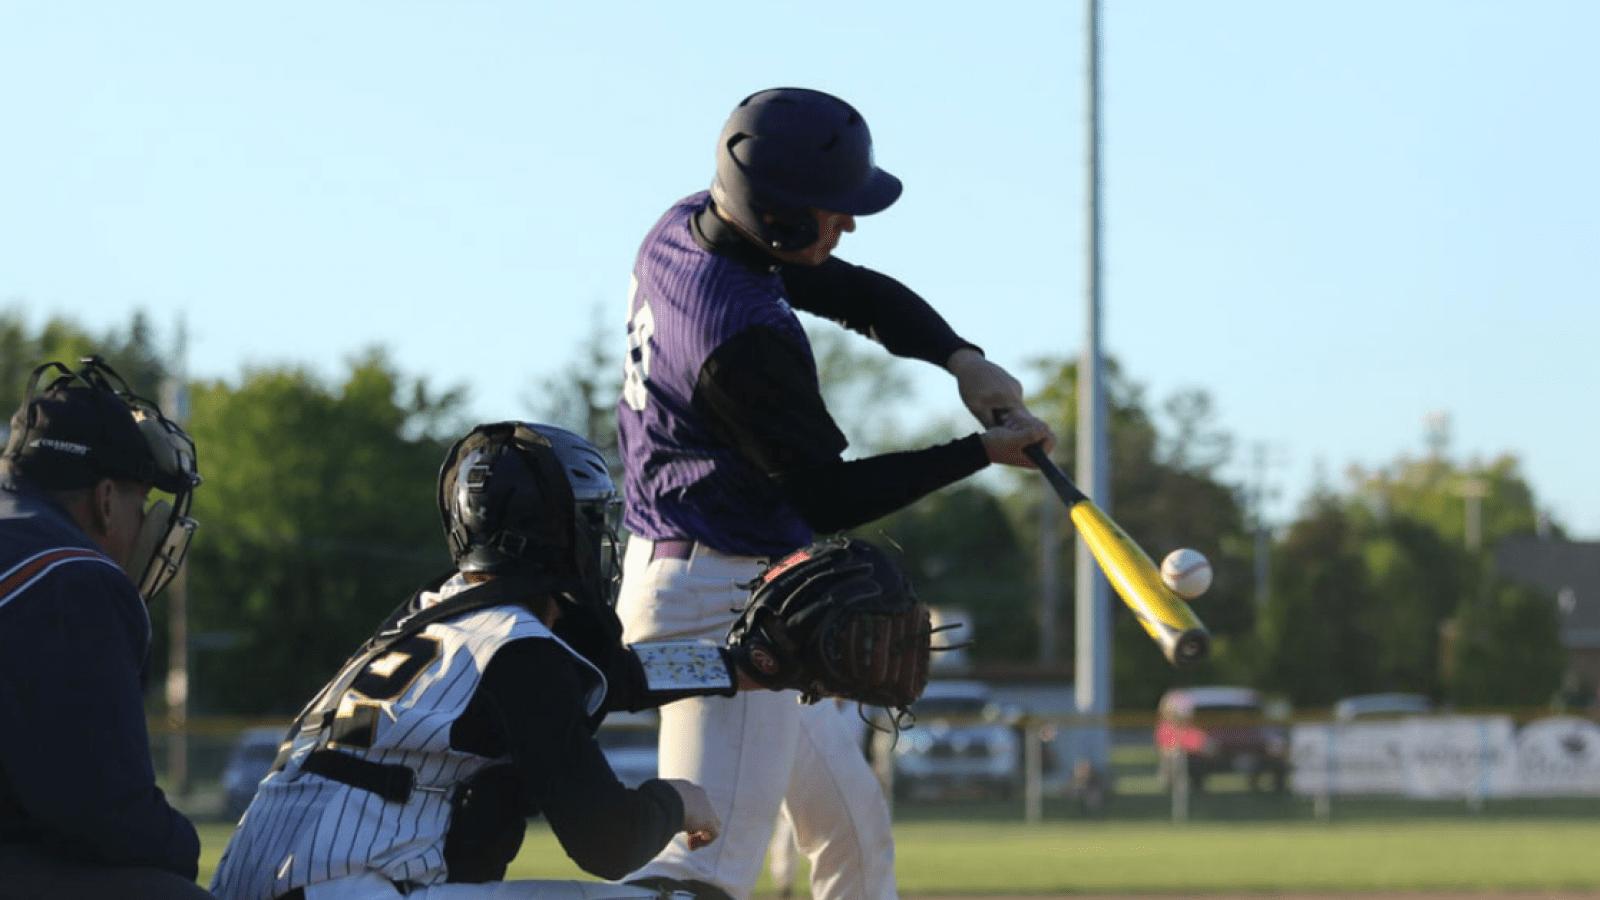 a baseball player holding a bat on a field